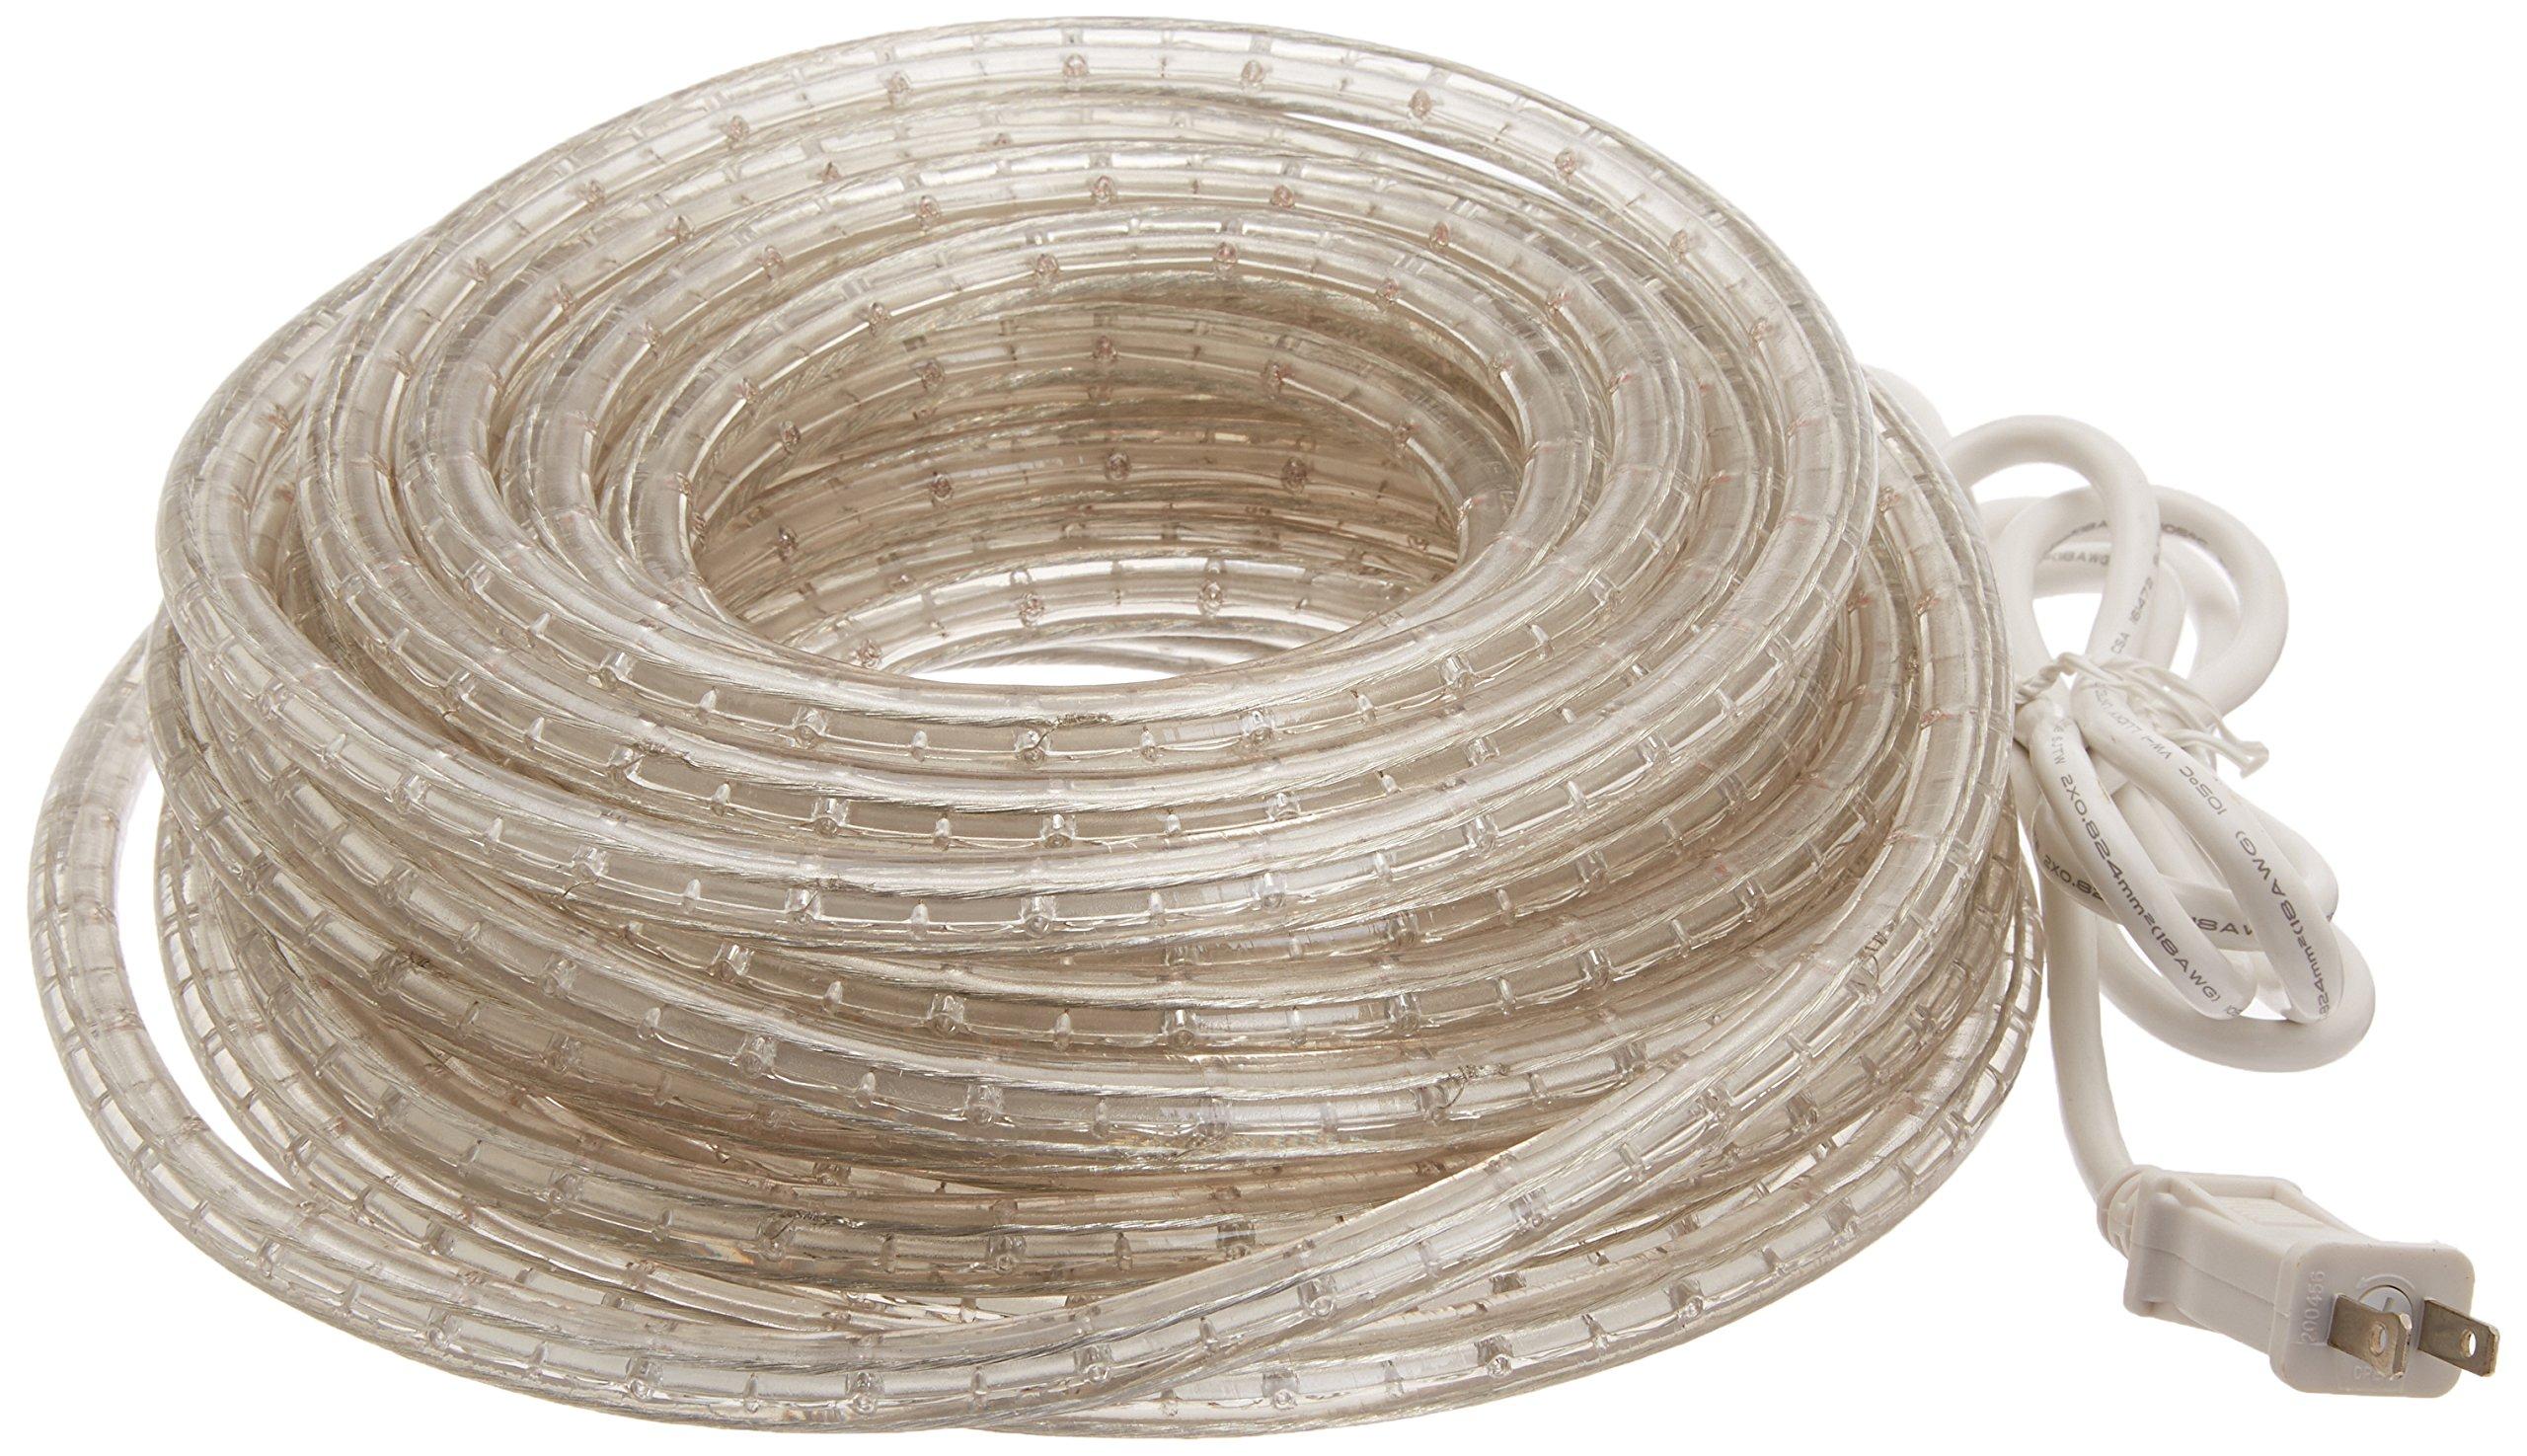 American Lighting 042-CL-50 Incandescent Rope Indoor/Outdoor Rated Light Kit, 50-Feet